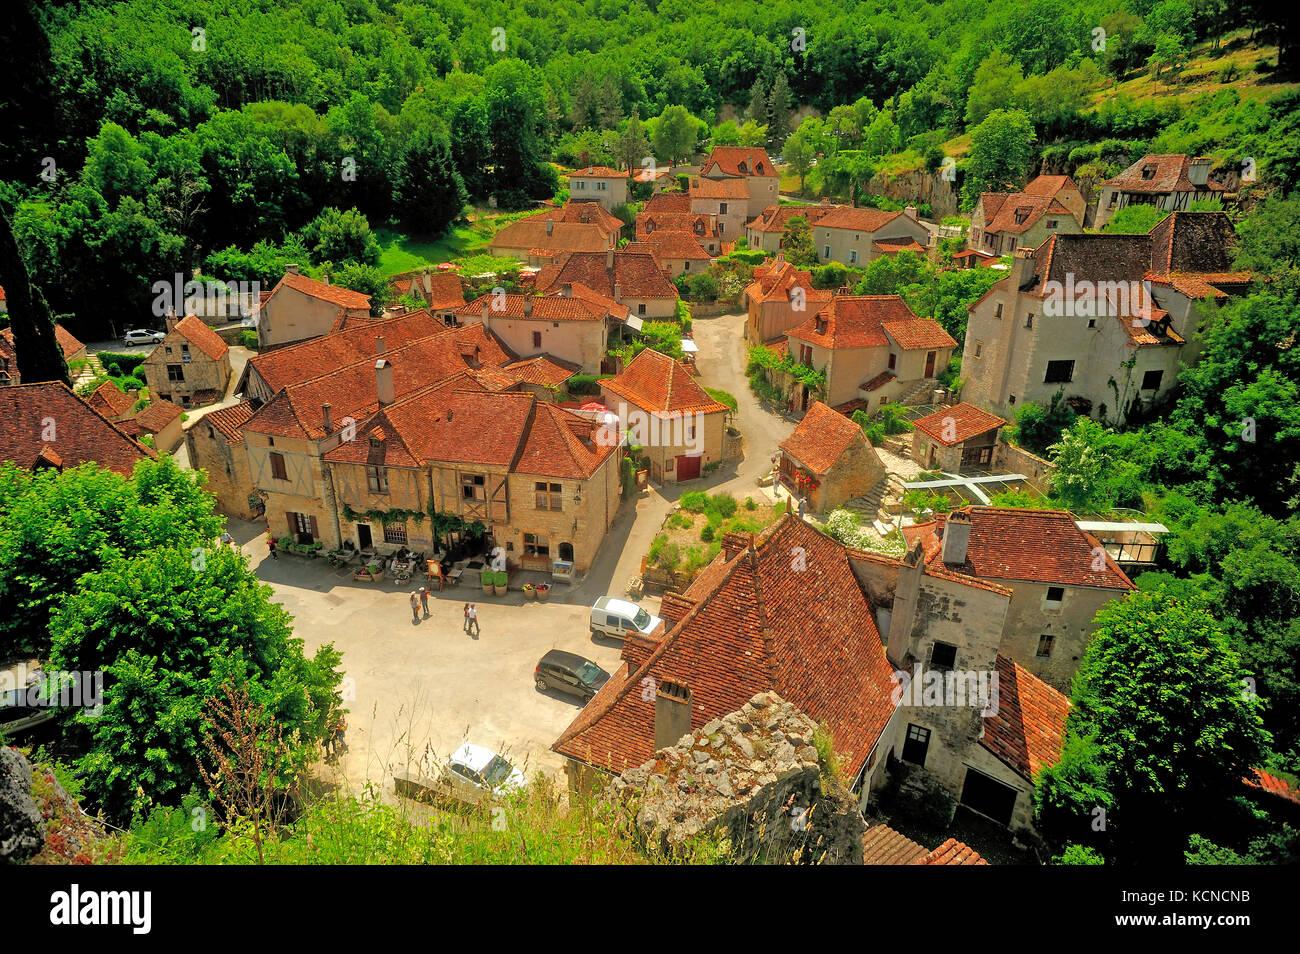 Saint-Cirq-Lapopie, Lot Department, Midi-Pyrénées, France - Stock Image